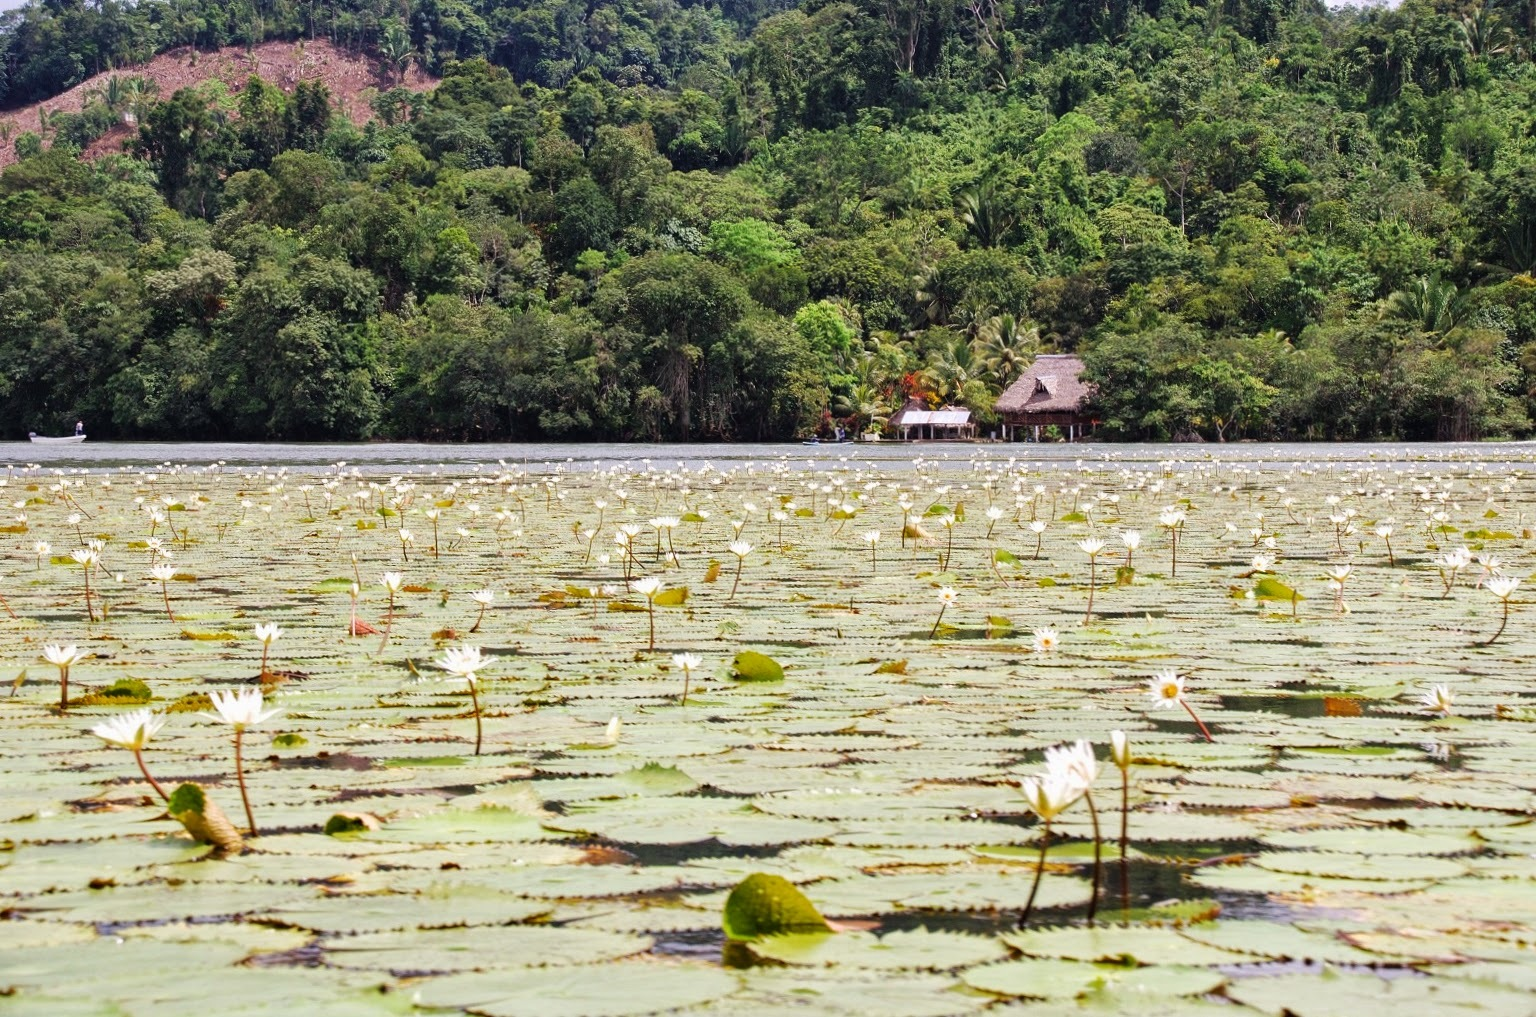 Gwatemala - Livingston - Rio Dulce